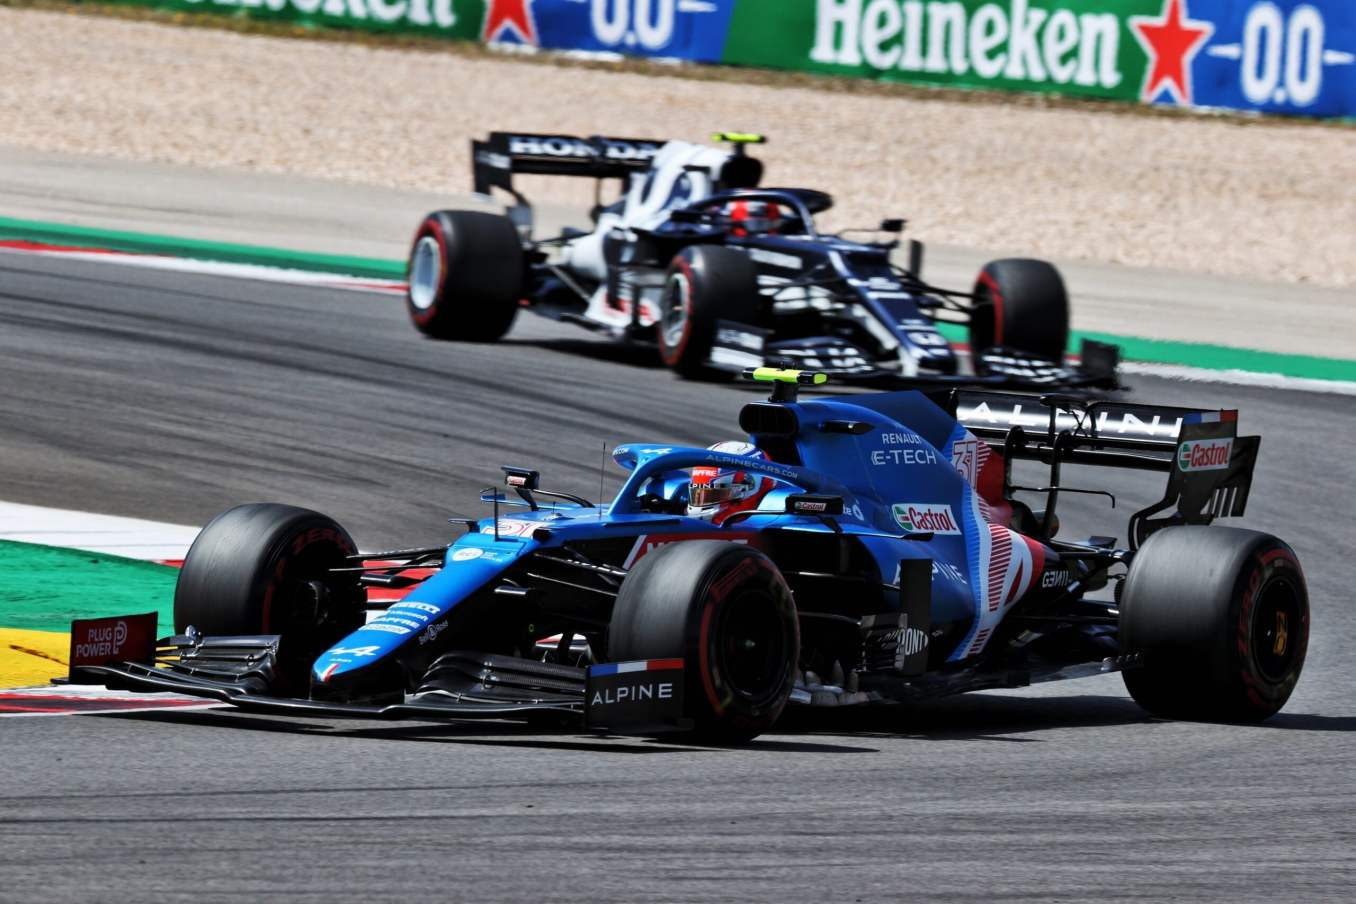 Alpine F1 Team A521 Alonso Ocon Grand Prix Portugal Course 7 scaled | Alpine F1 Team poursuivra sa progression au Grand Prix d'Espagne 2021